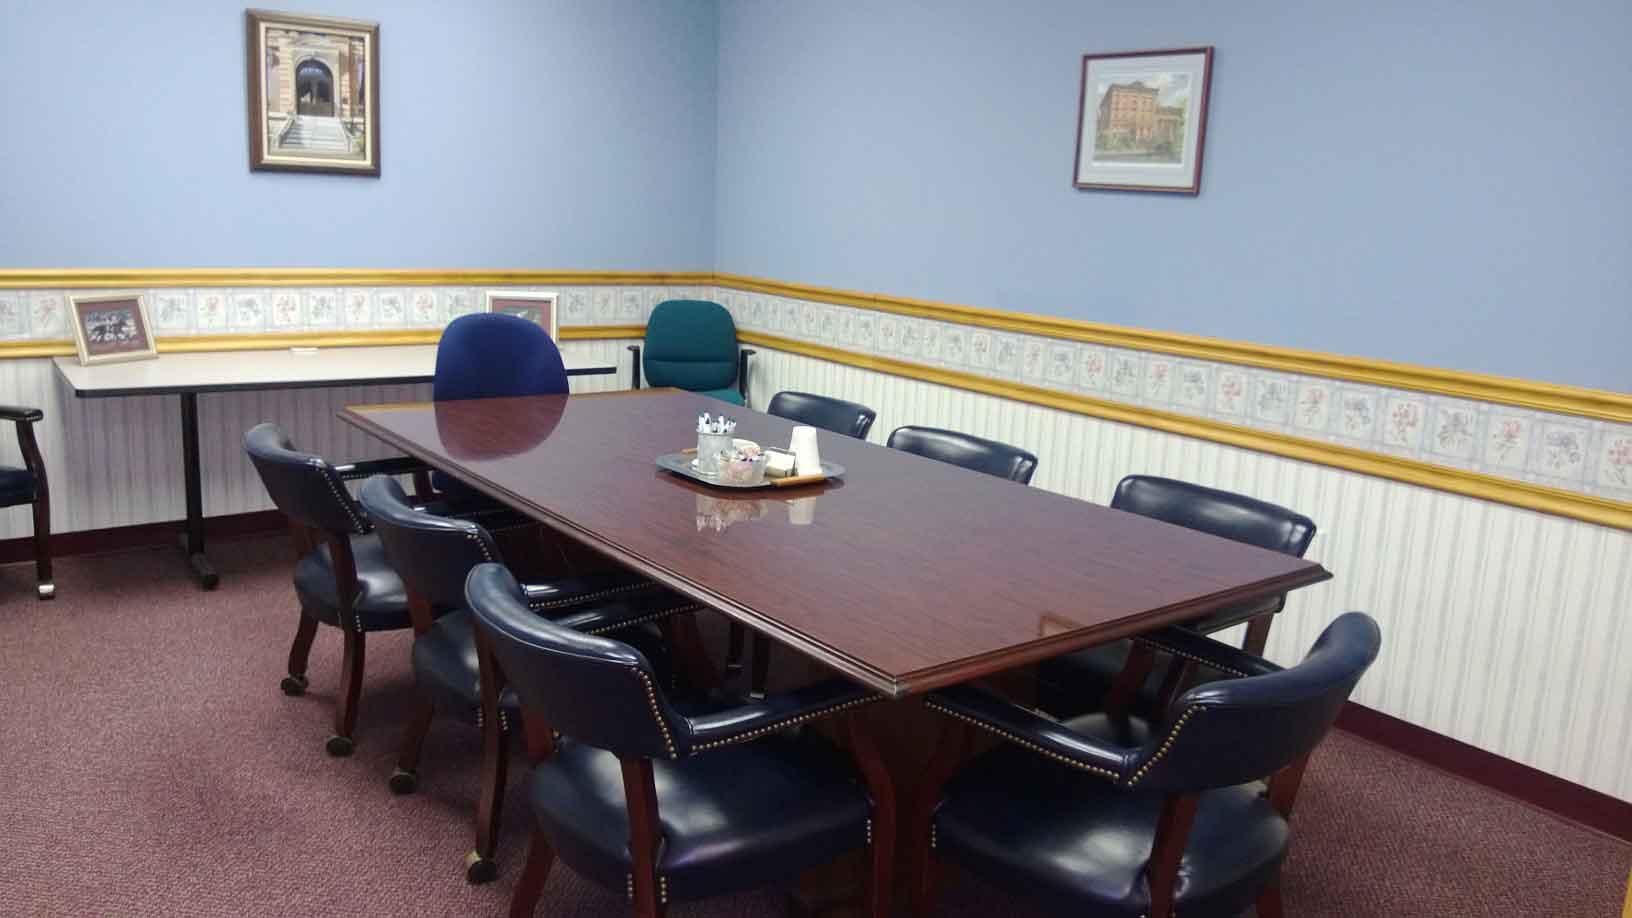 Meeting Rooms, Conference Room Rentals, Saratoga, Malta, NY